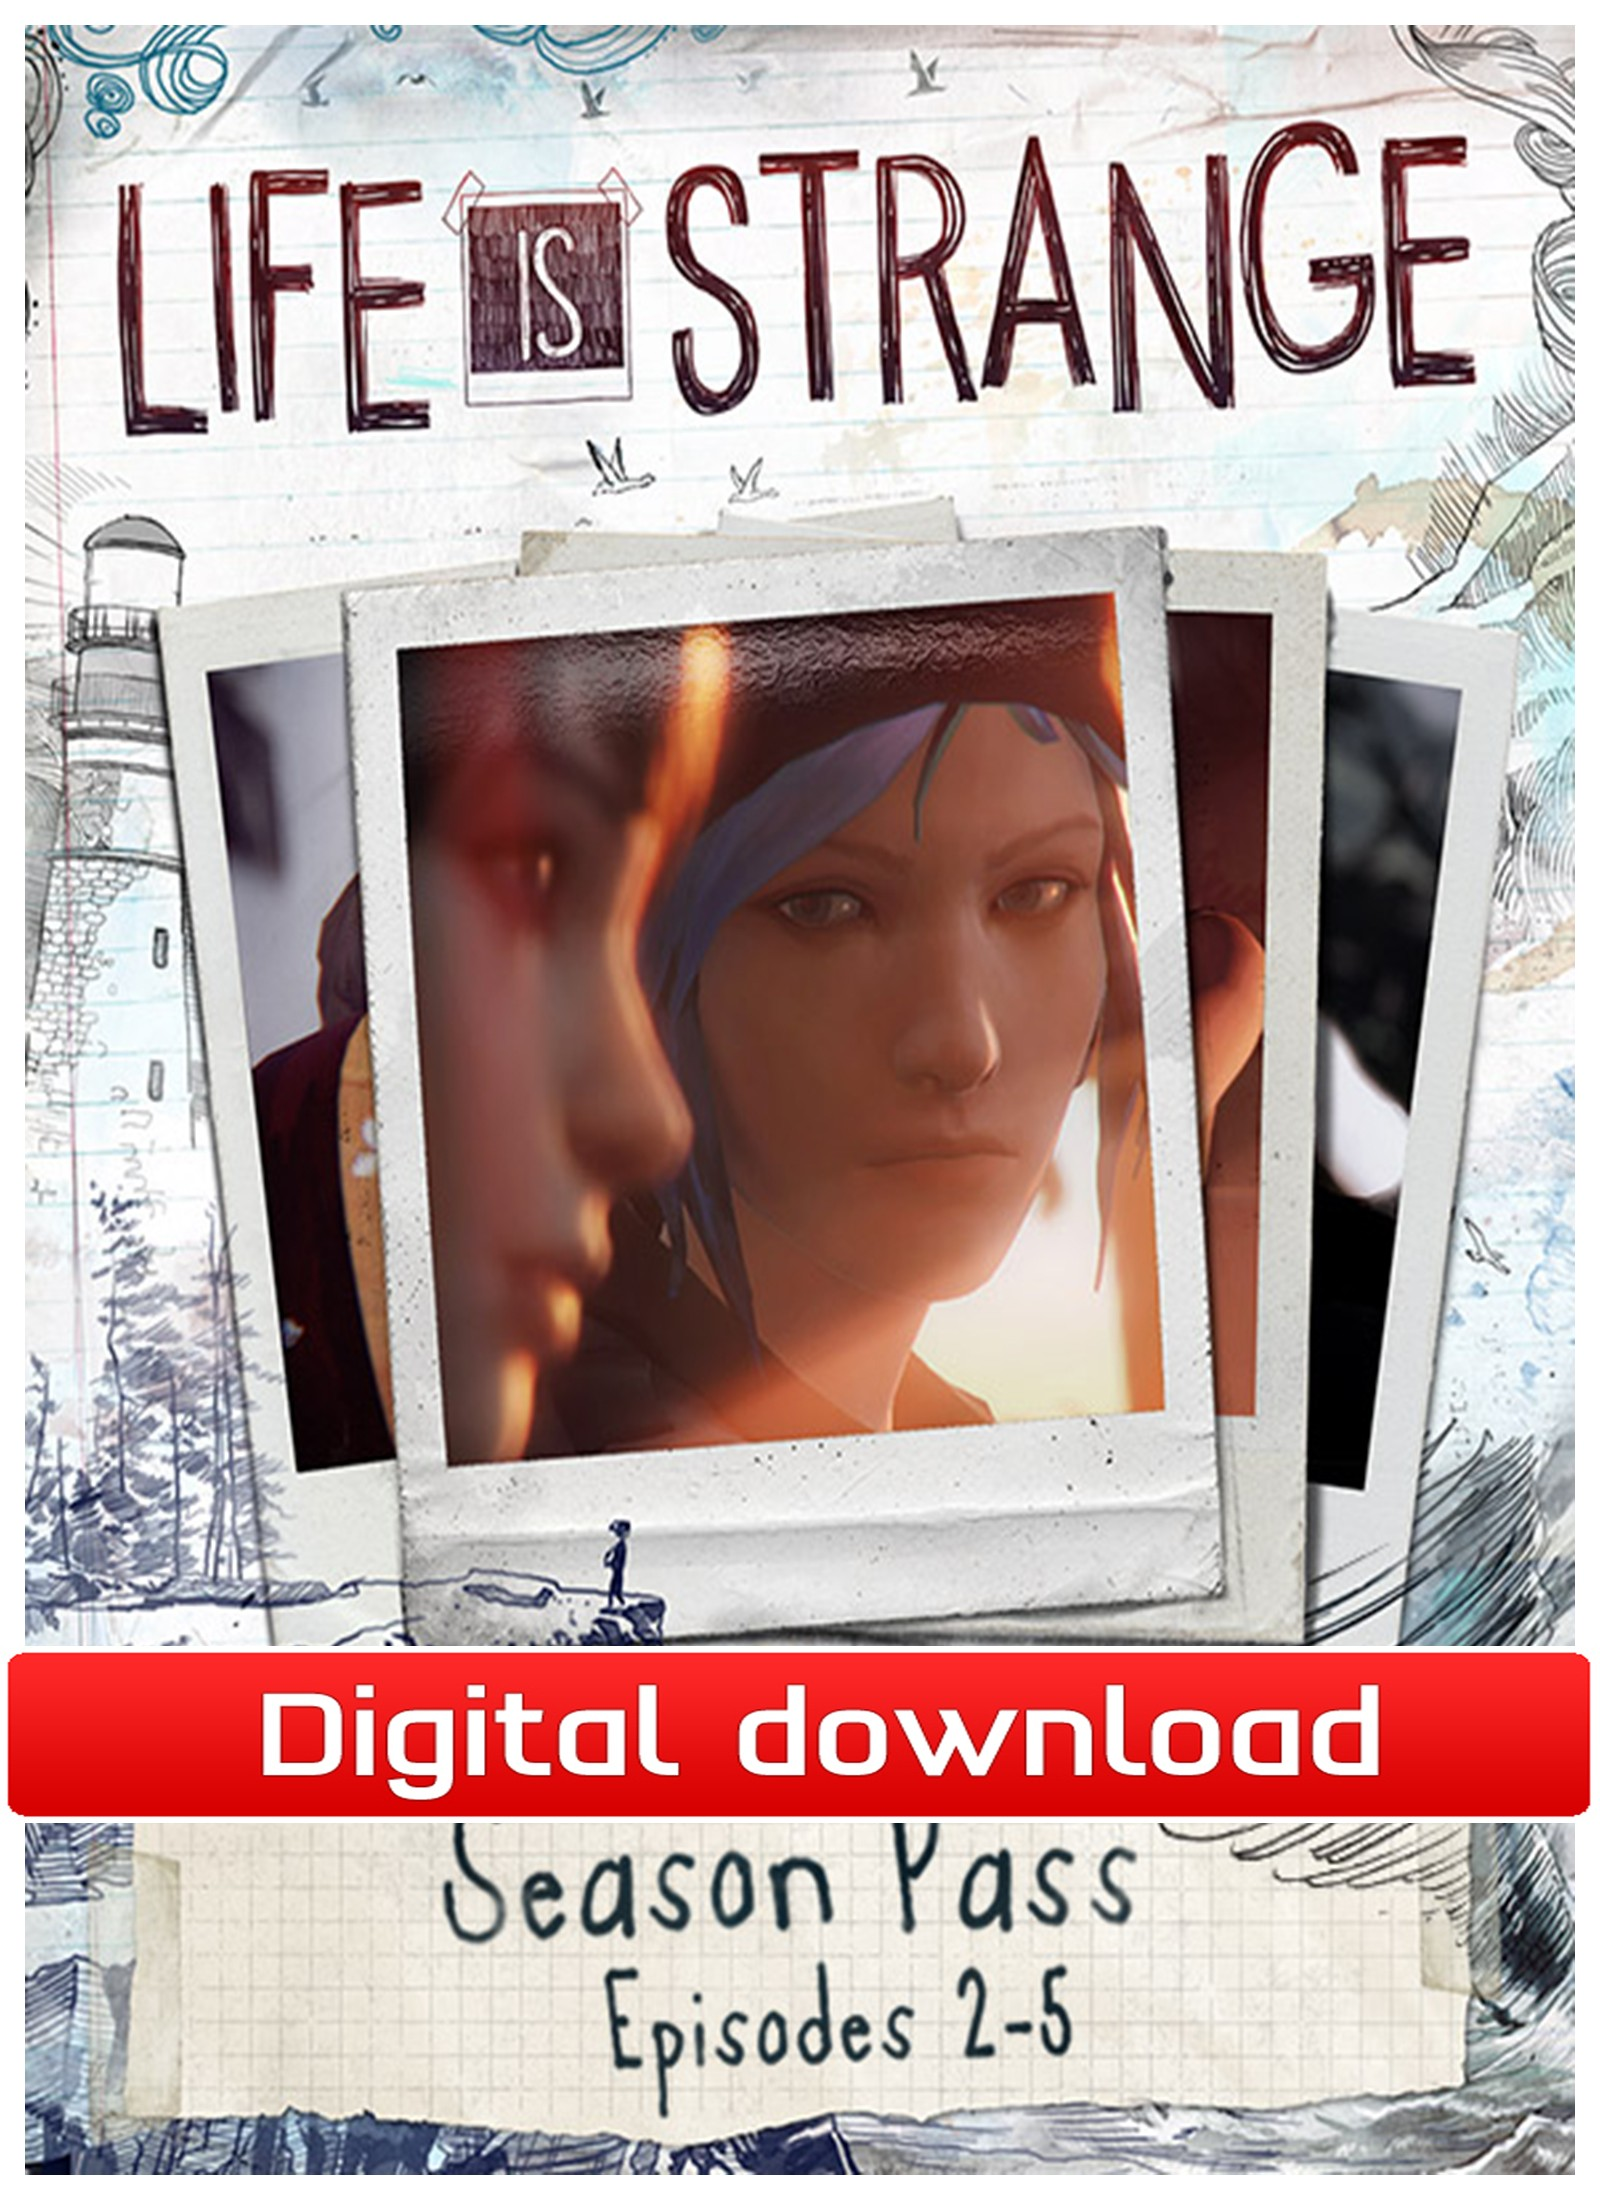 36755 : Life Is Strange Season Pass Episodes 2-5 (PC nedl)